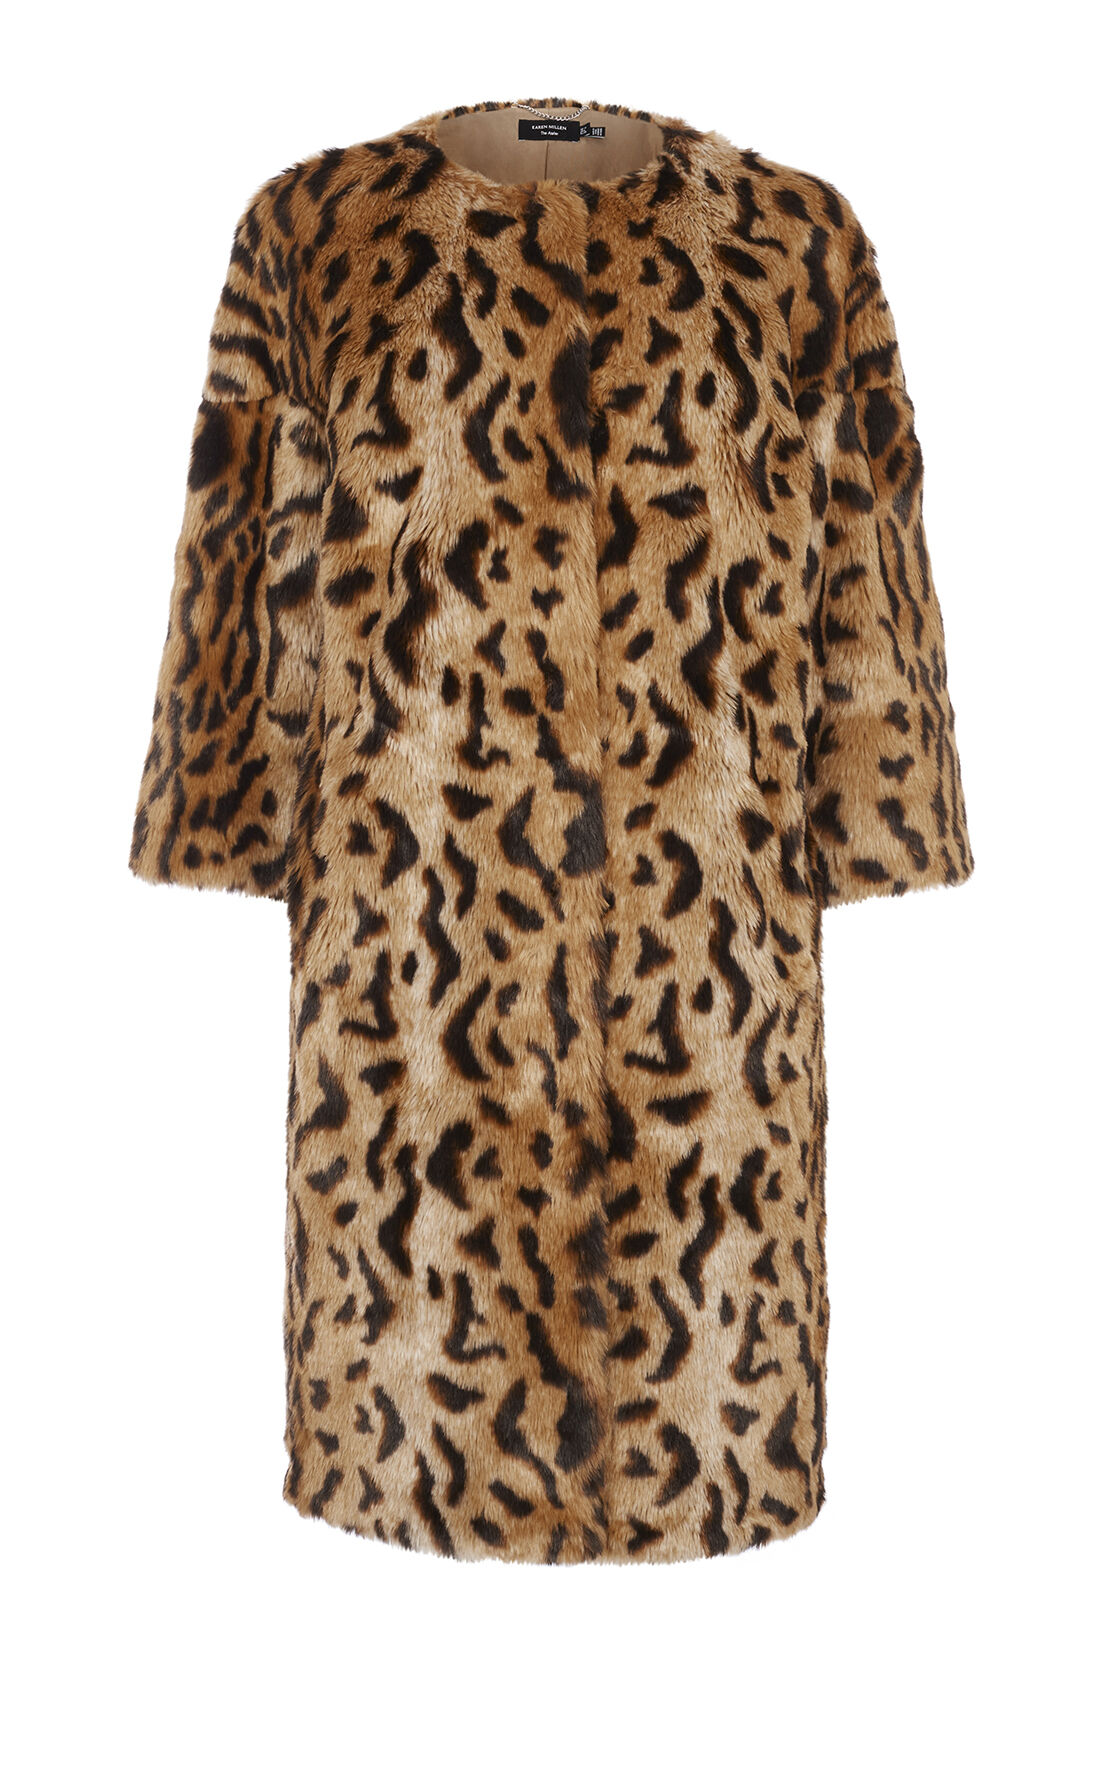 Karen Millen, LEOPARD PRINT FAUX FUR COAT Leopard Print 0